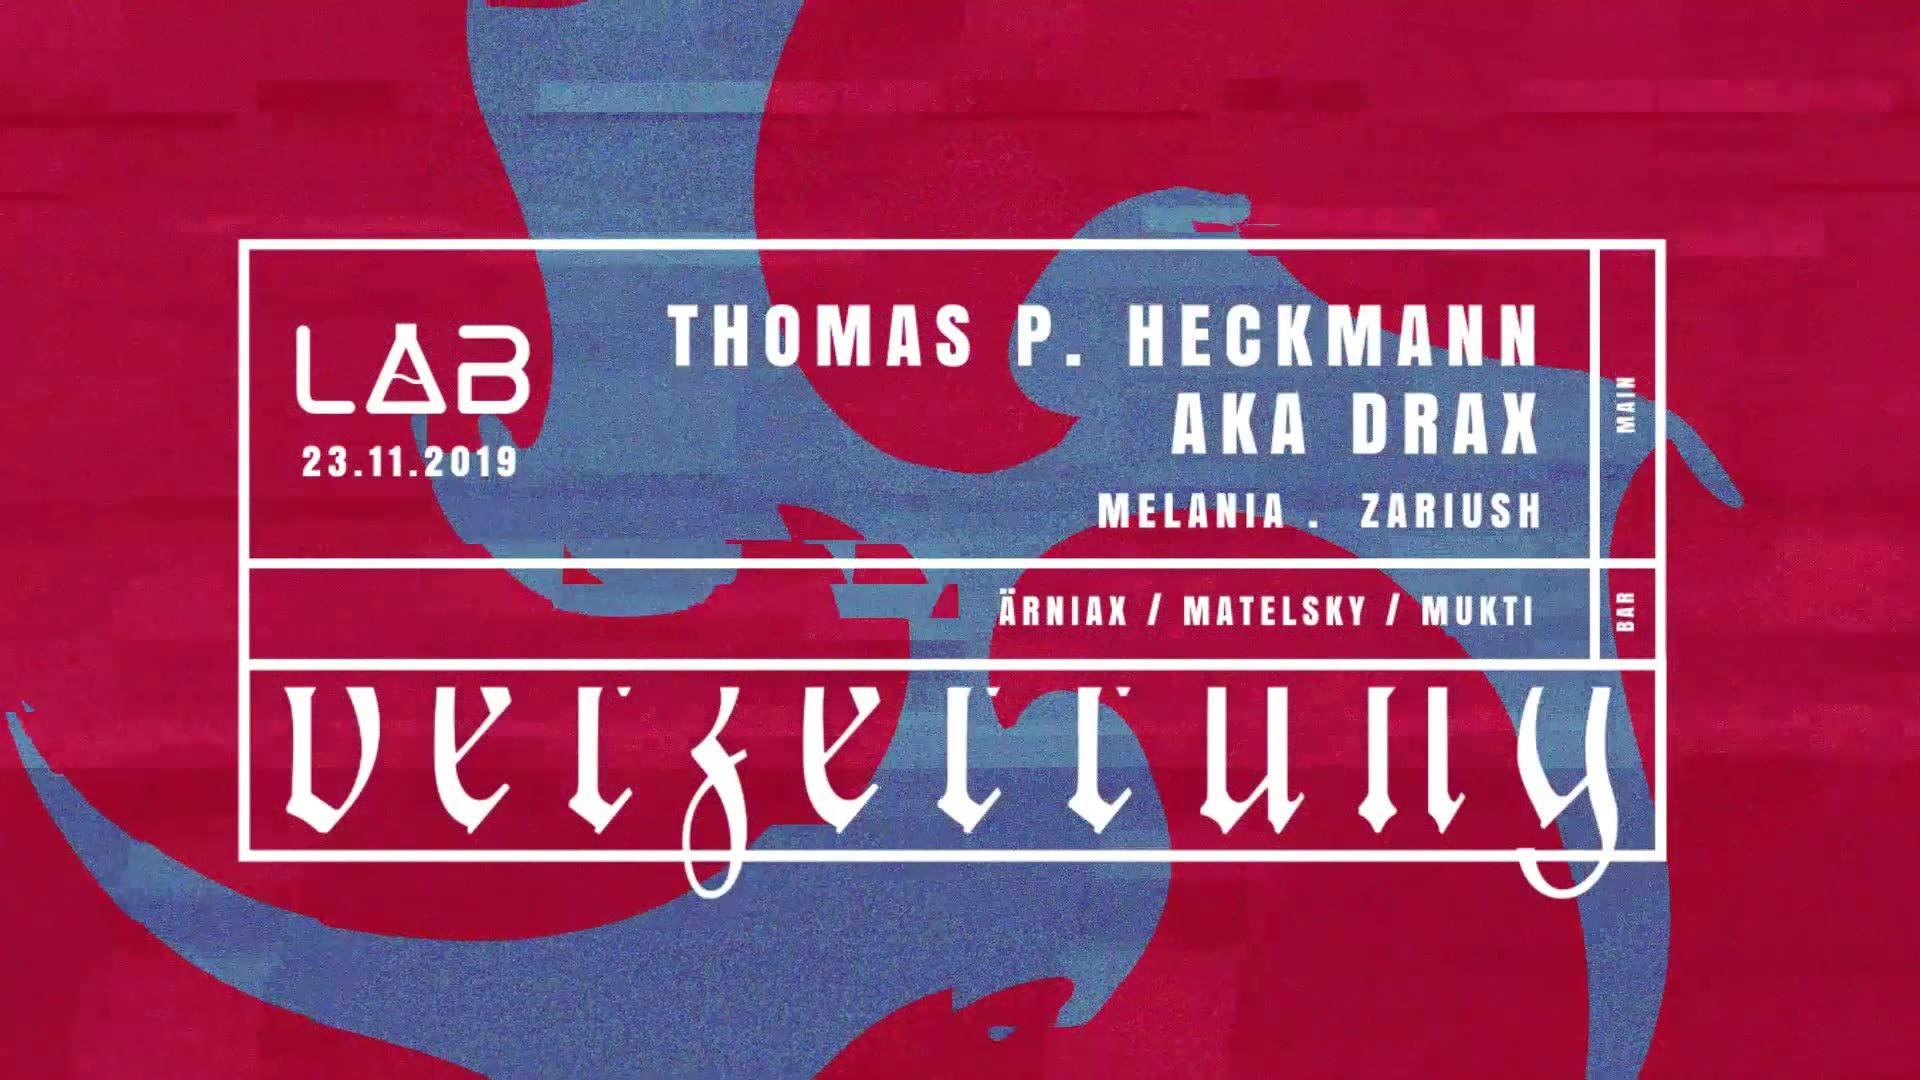 Verzerrung: Thomas P. Heckmann aka DRAX